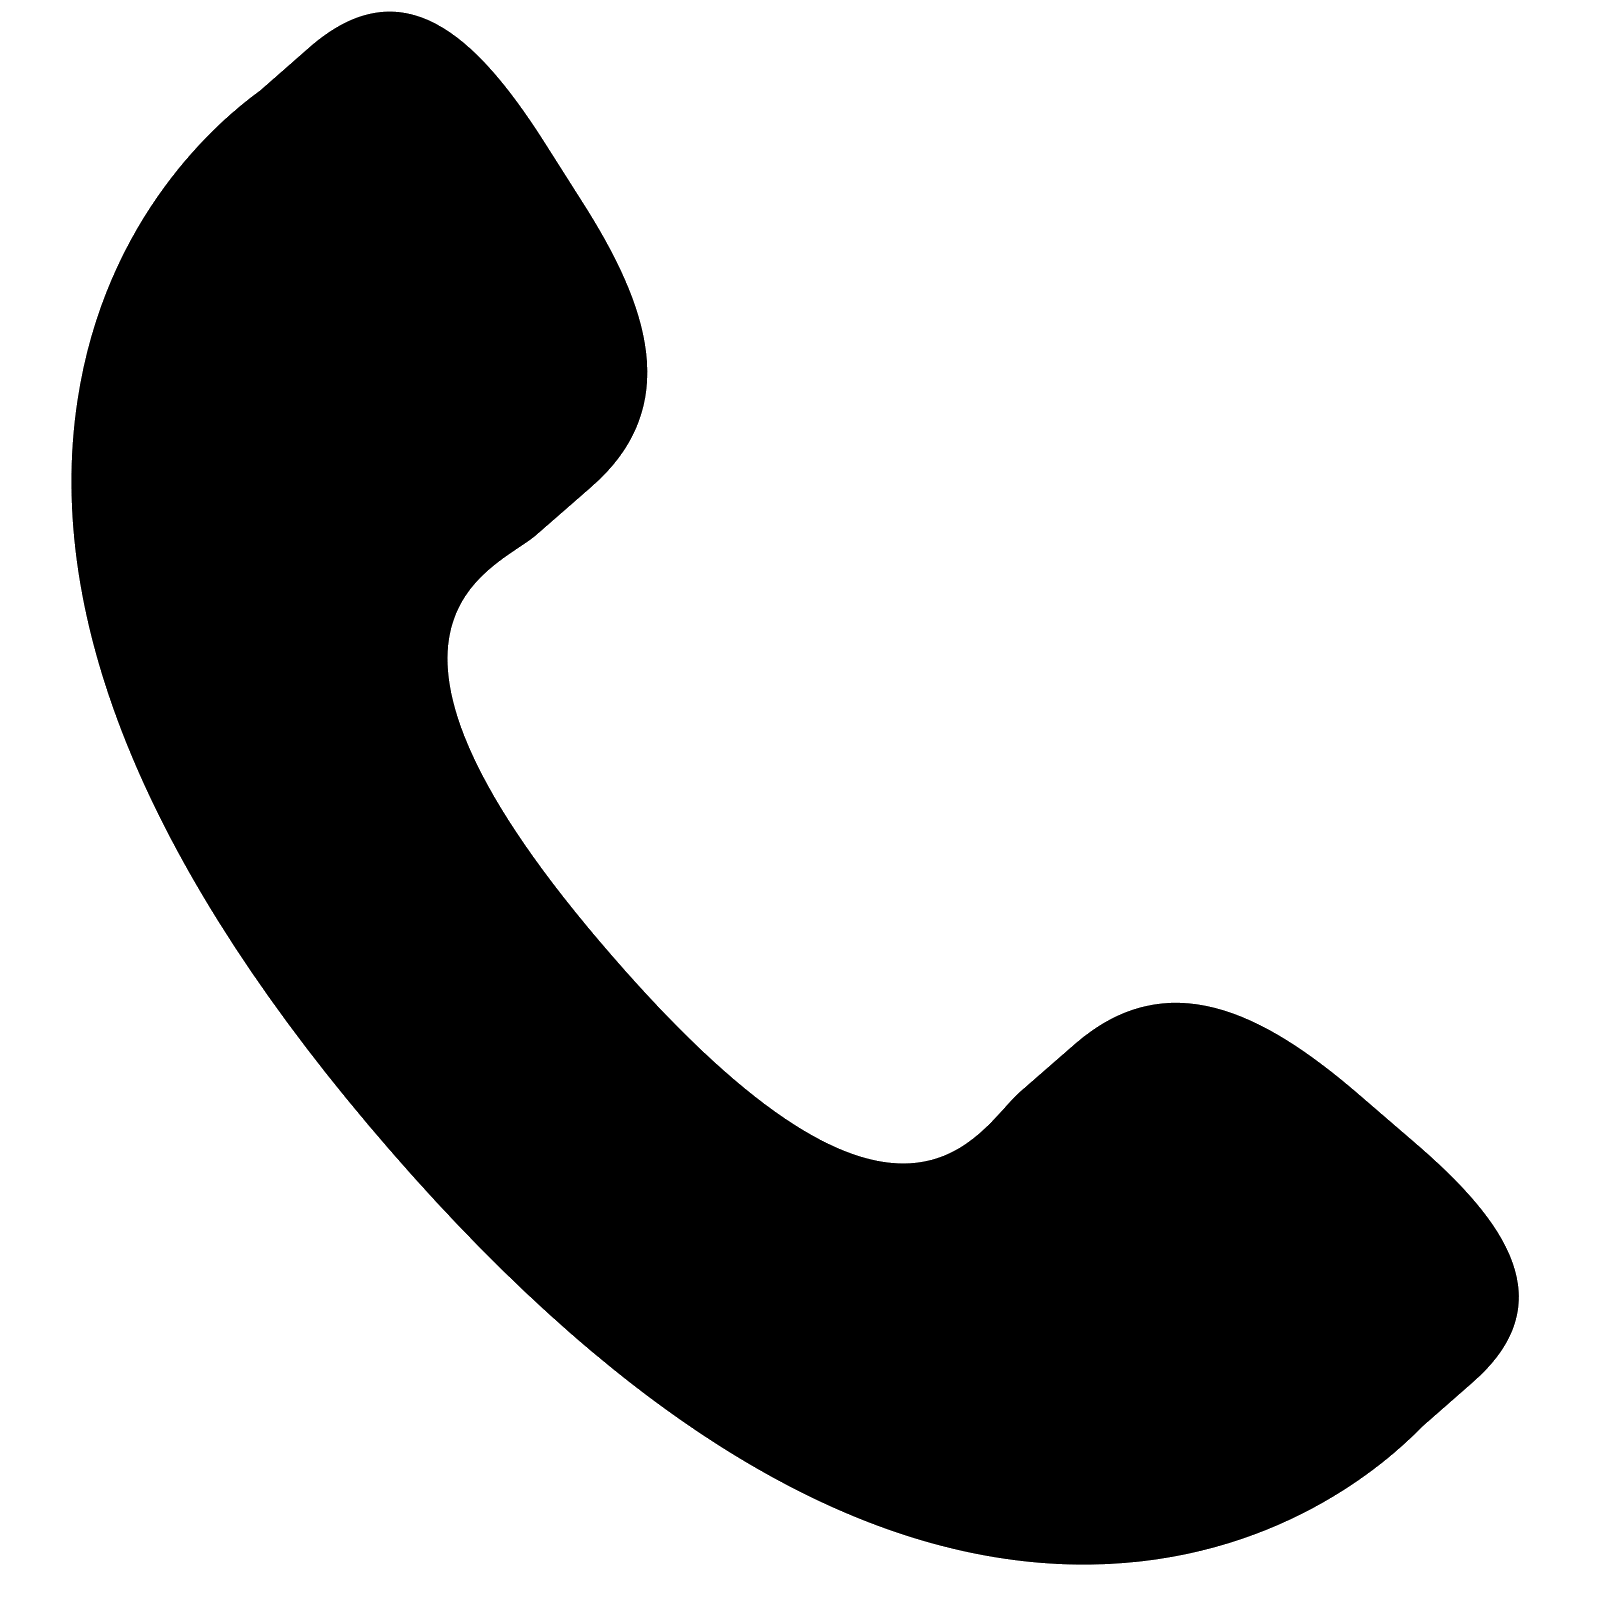 1600x1600 Icono